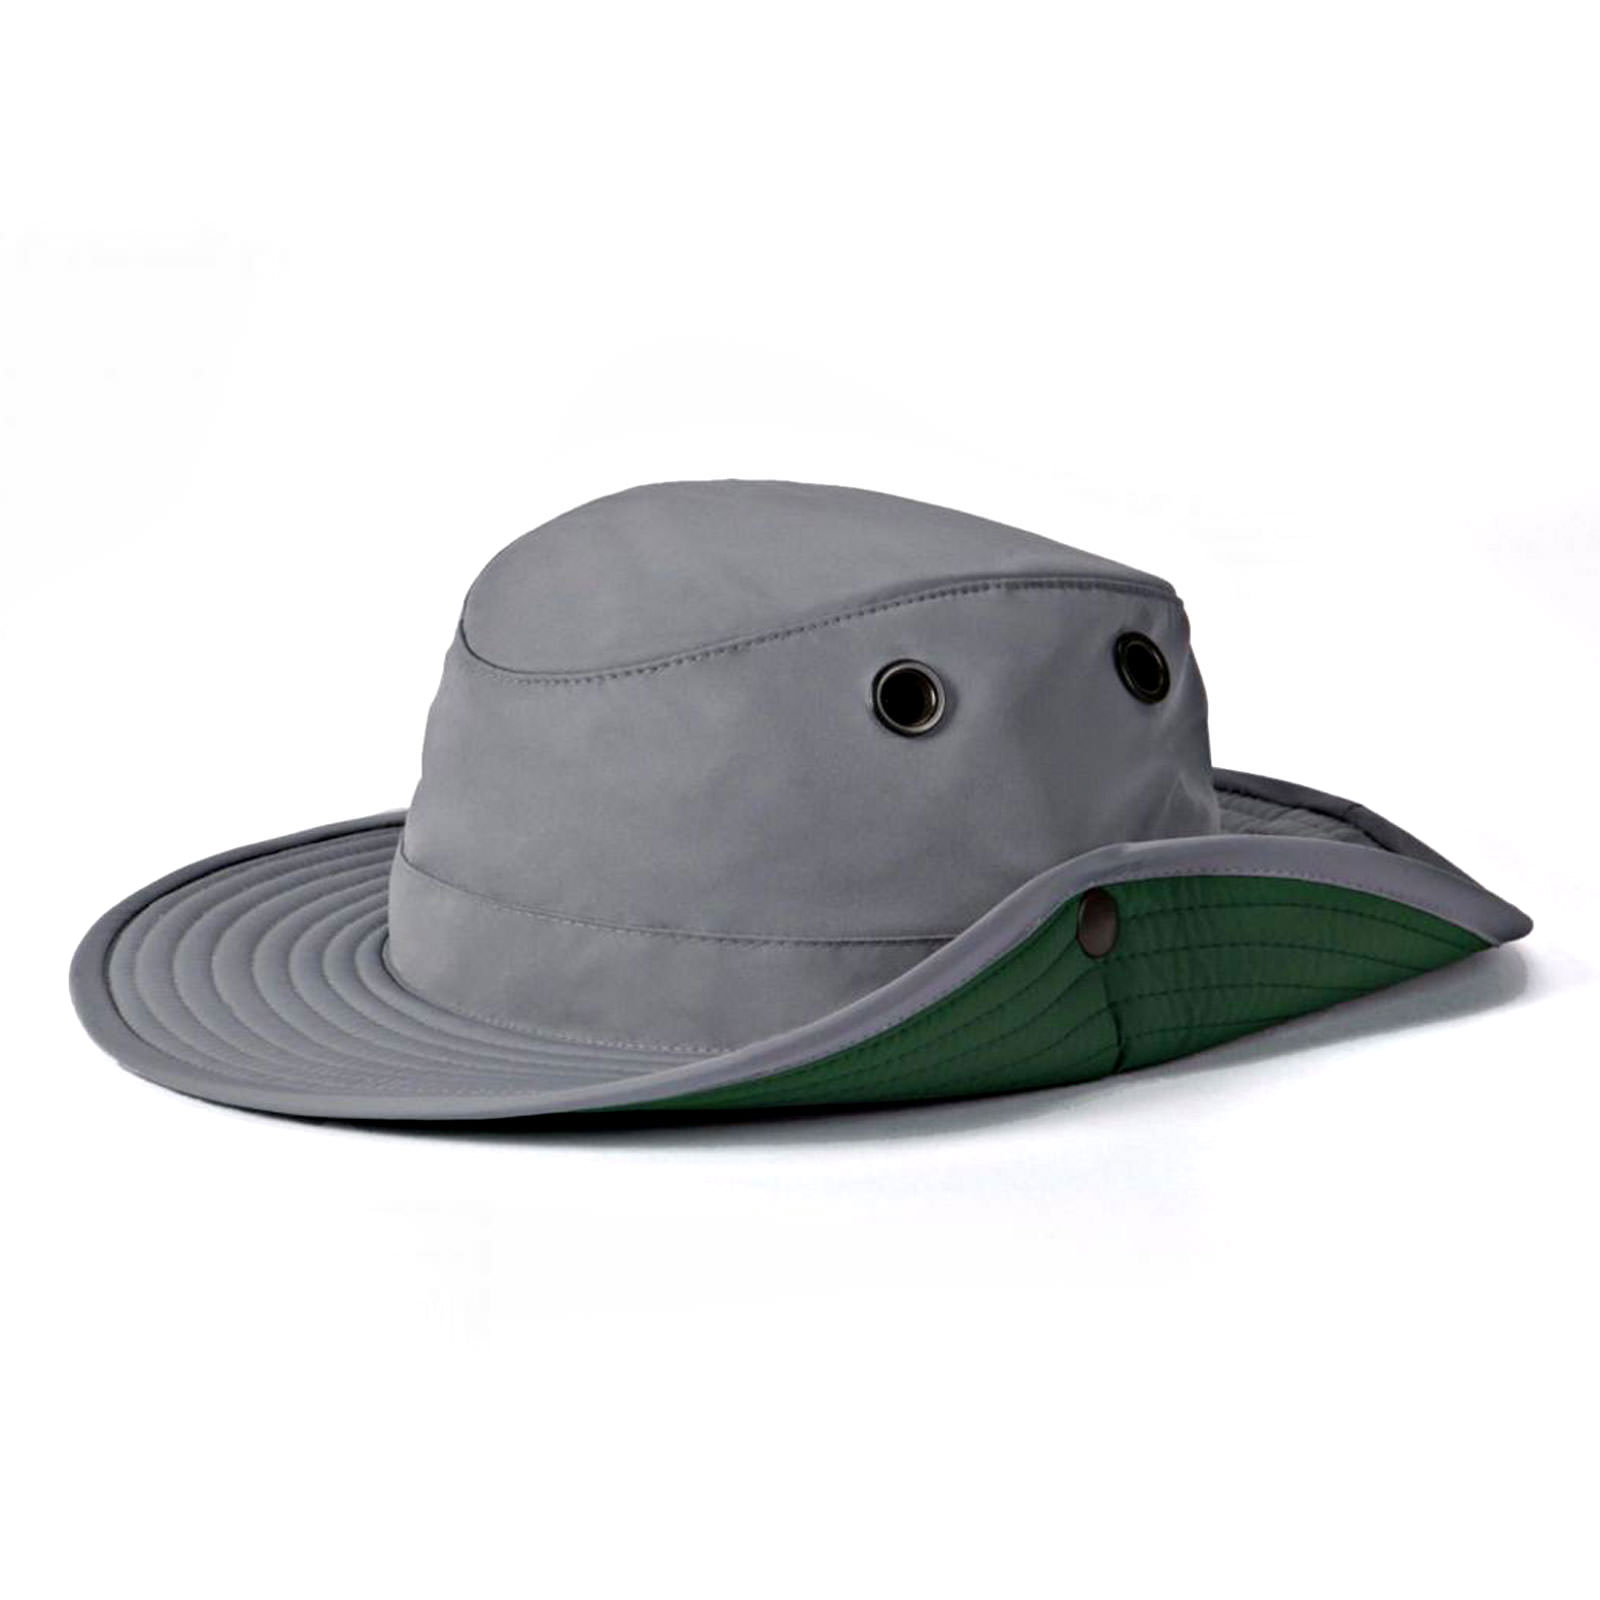 Tilley s Paddler s Hat - AvidMax 7c459d82b0b